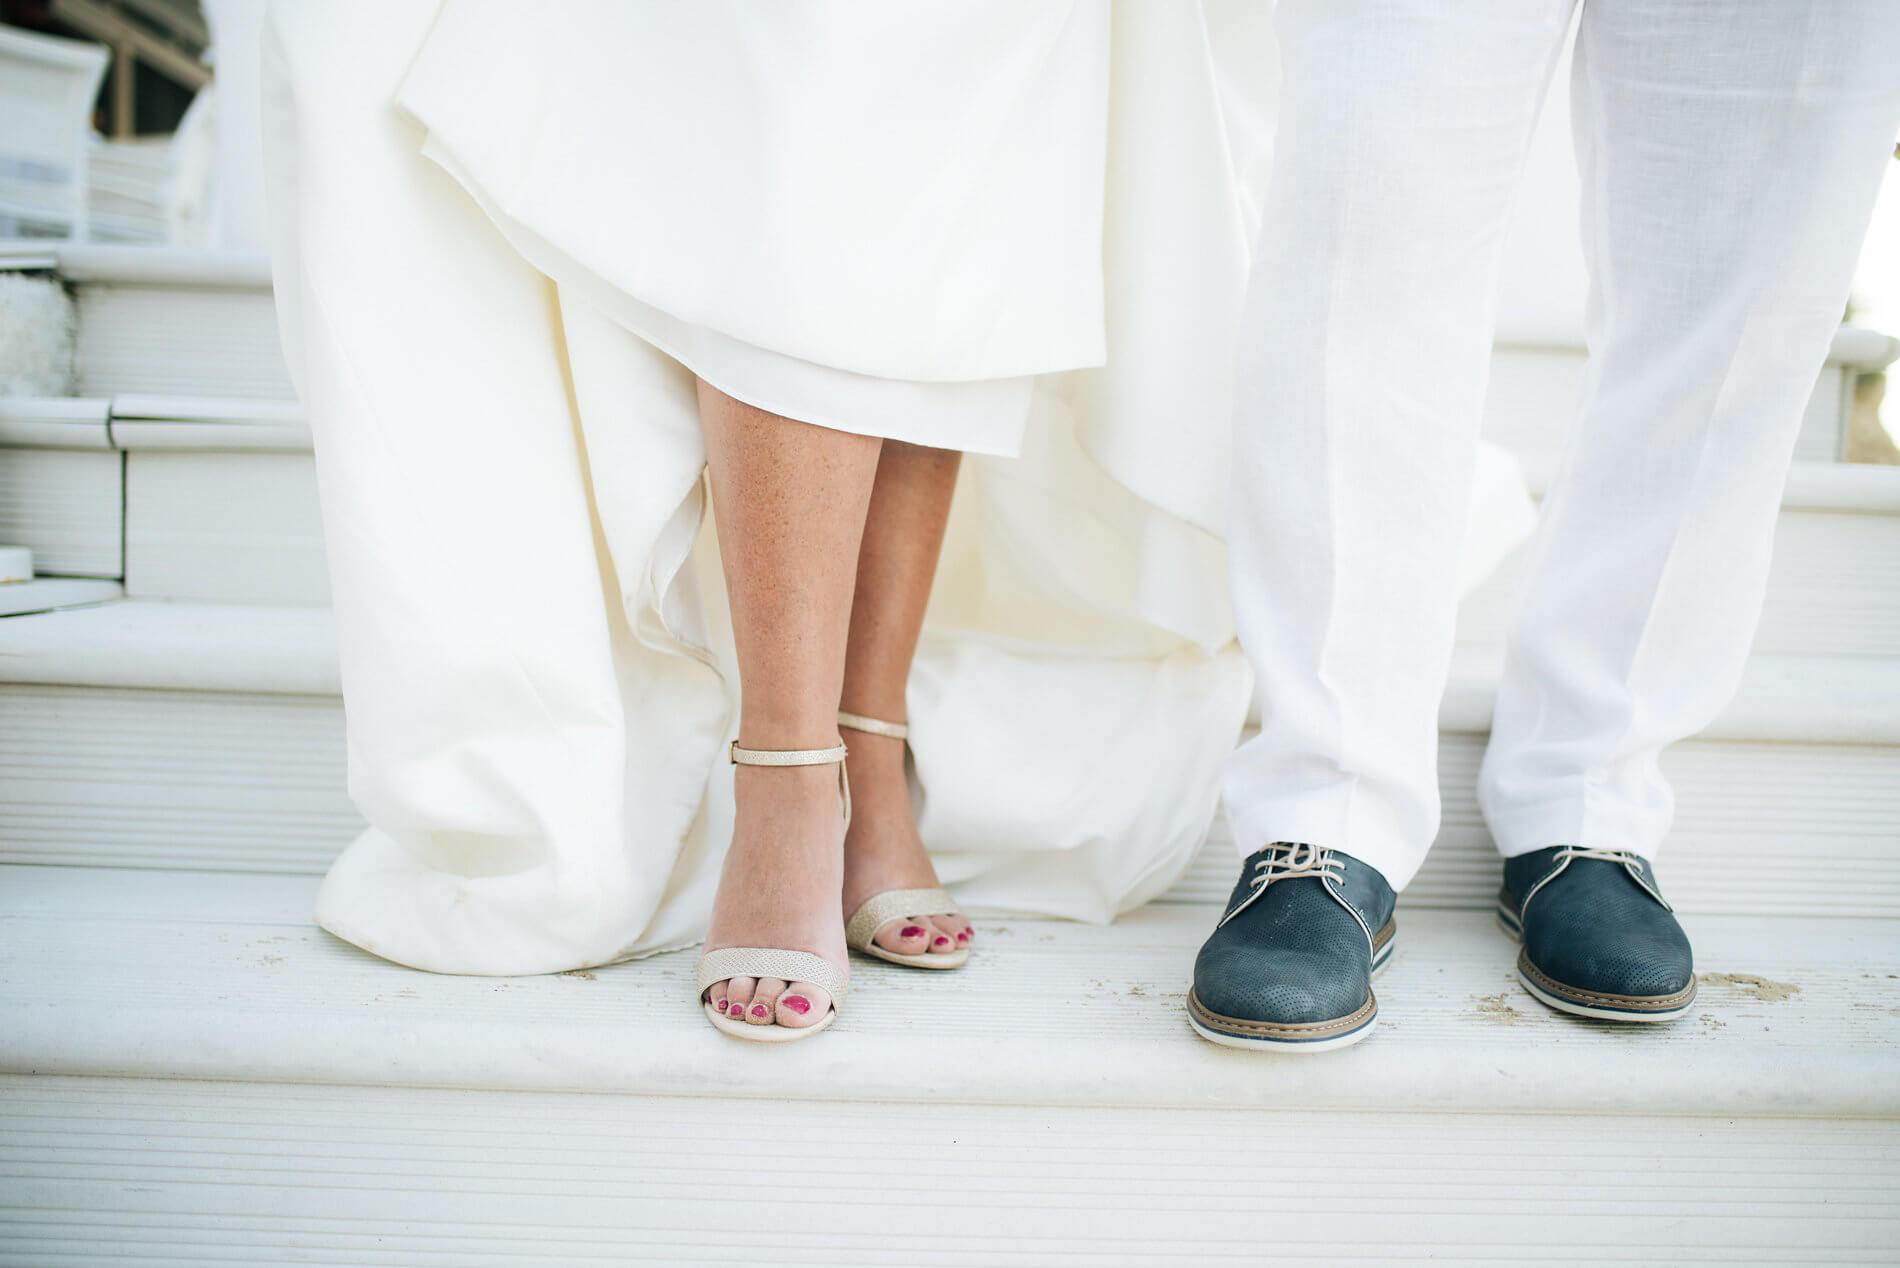 https://www.white-ibiza.com/wp-content/uploads/2020/03/ibiza-wedding-venue-maya-beach-club-2020-04.jpg